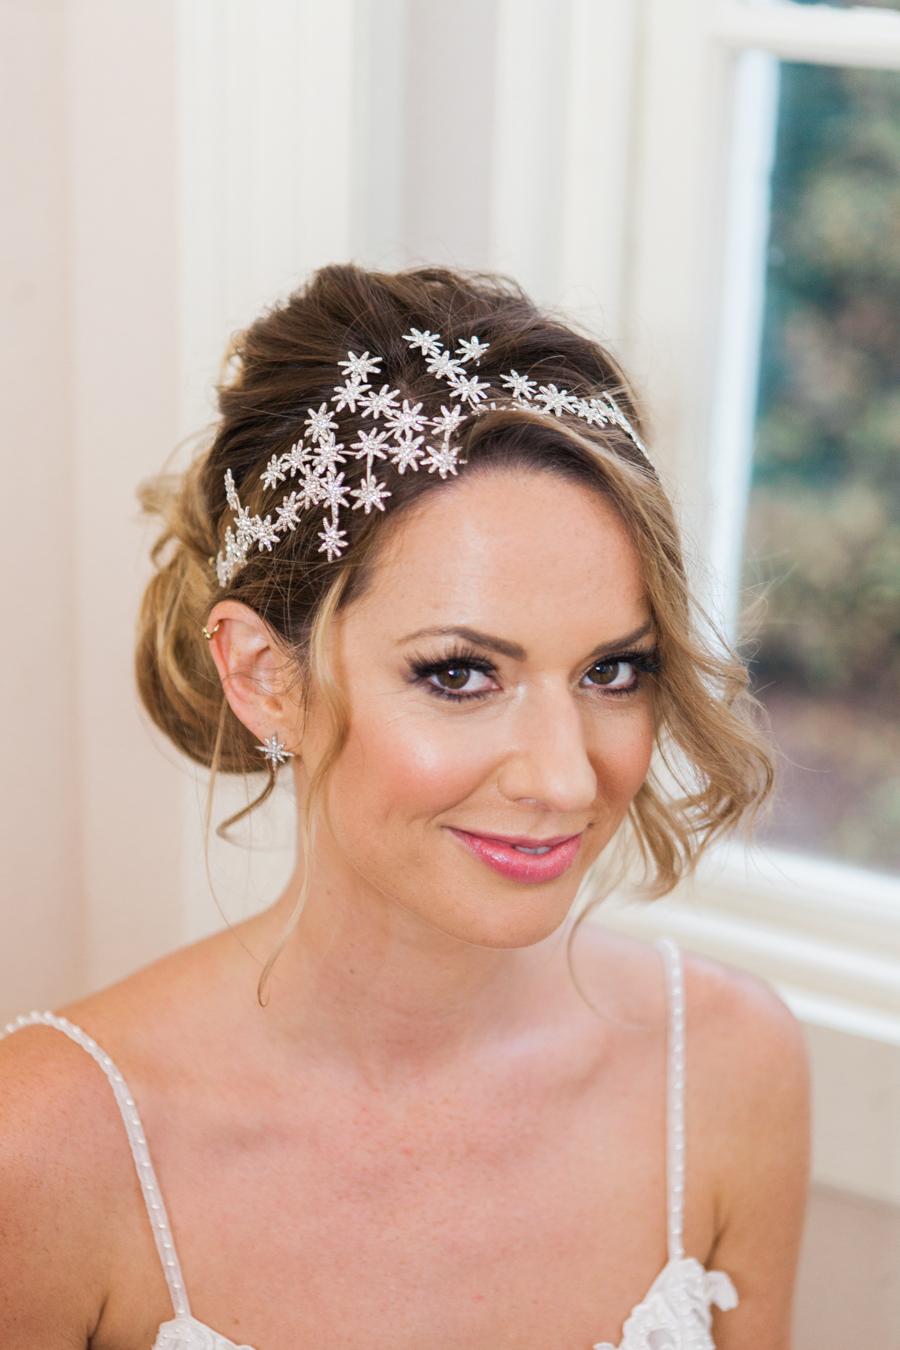 Starry celestial wedding inspiration (with a sprinkling of Disney magic) - Amanda Karen Photography (50)